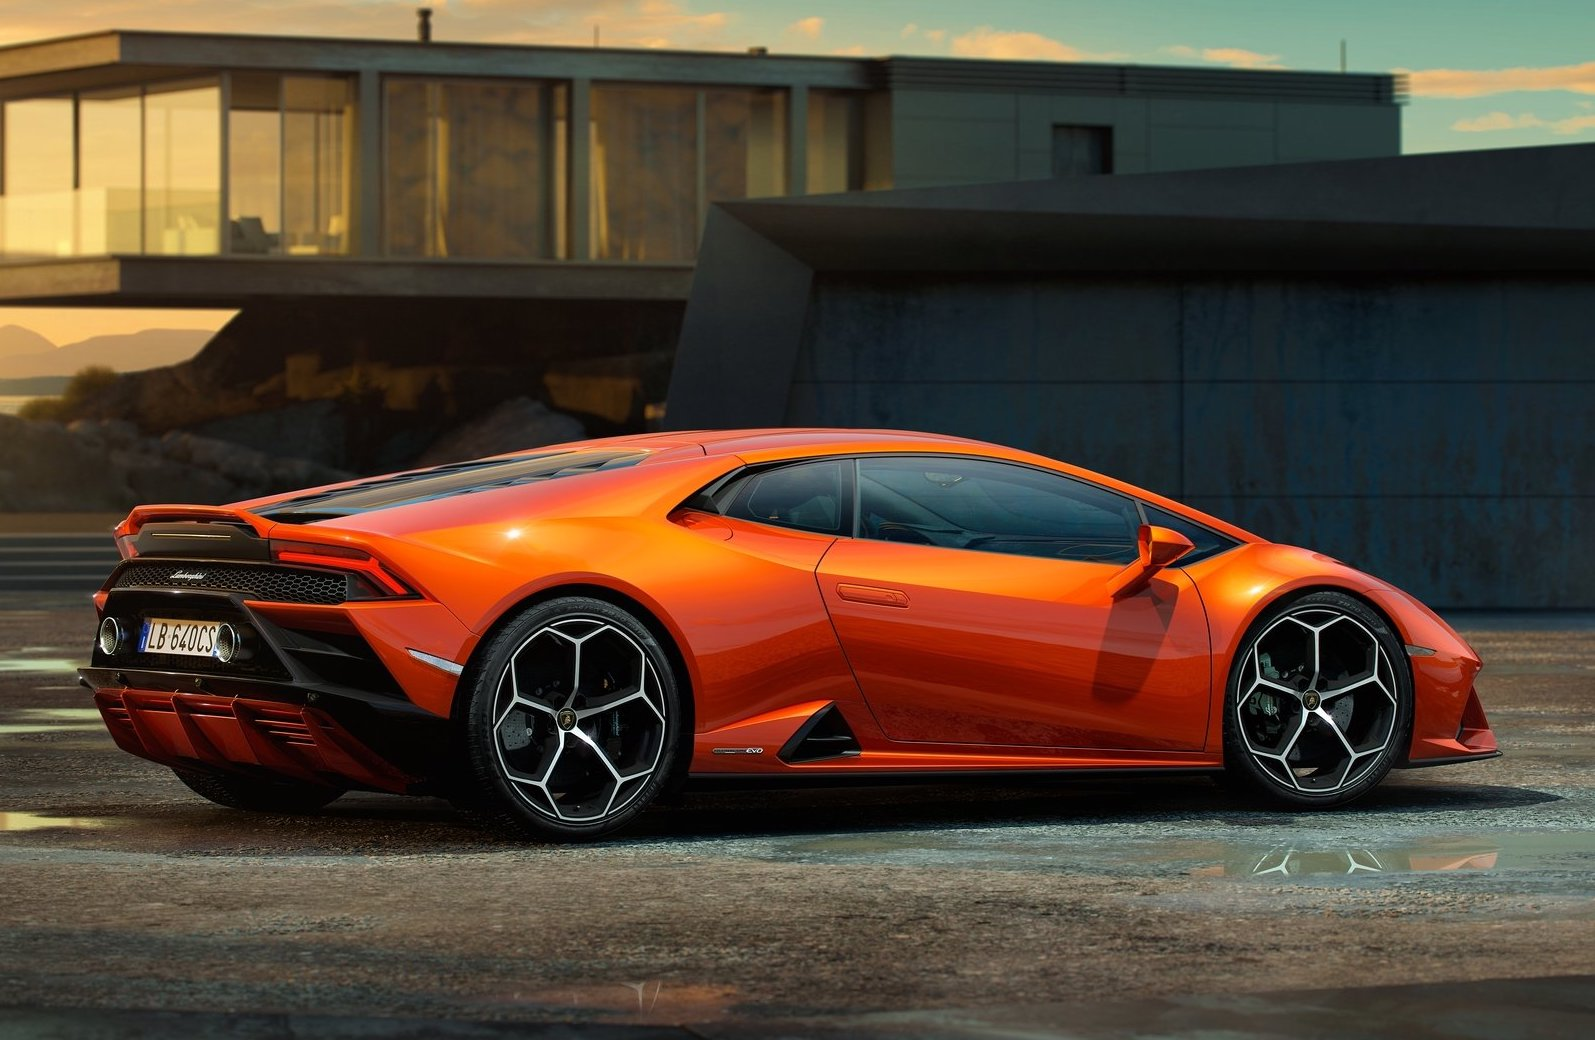 2019 Lamborghini Huracan EVO revealed - PerformanceDrive